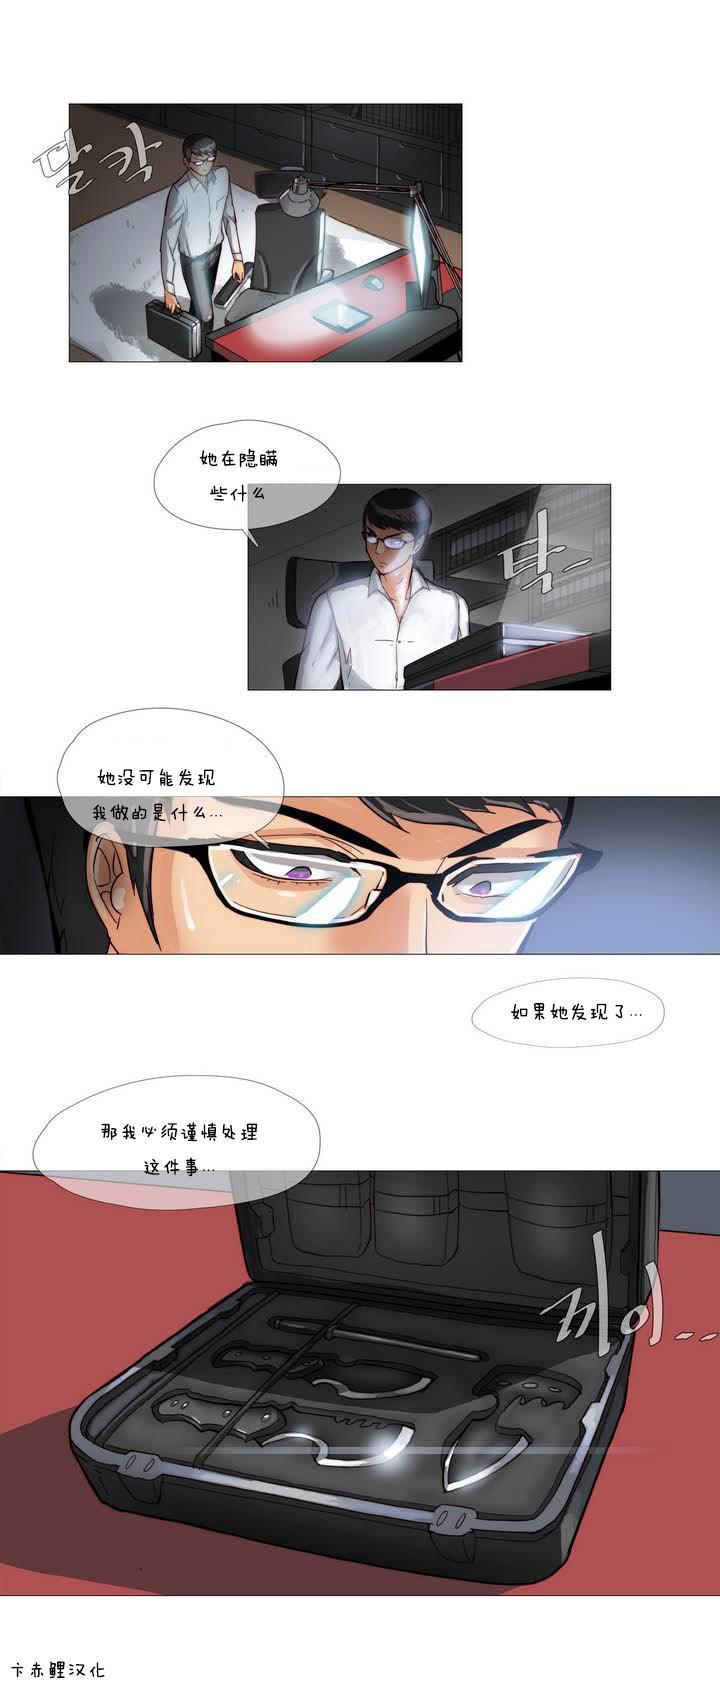 HouseHold Affairs 【卞赤鲤个人汉化】1~21话(持续更新中) 14